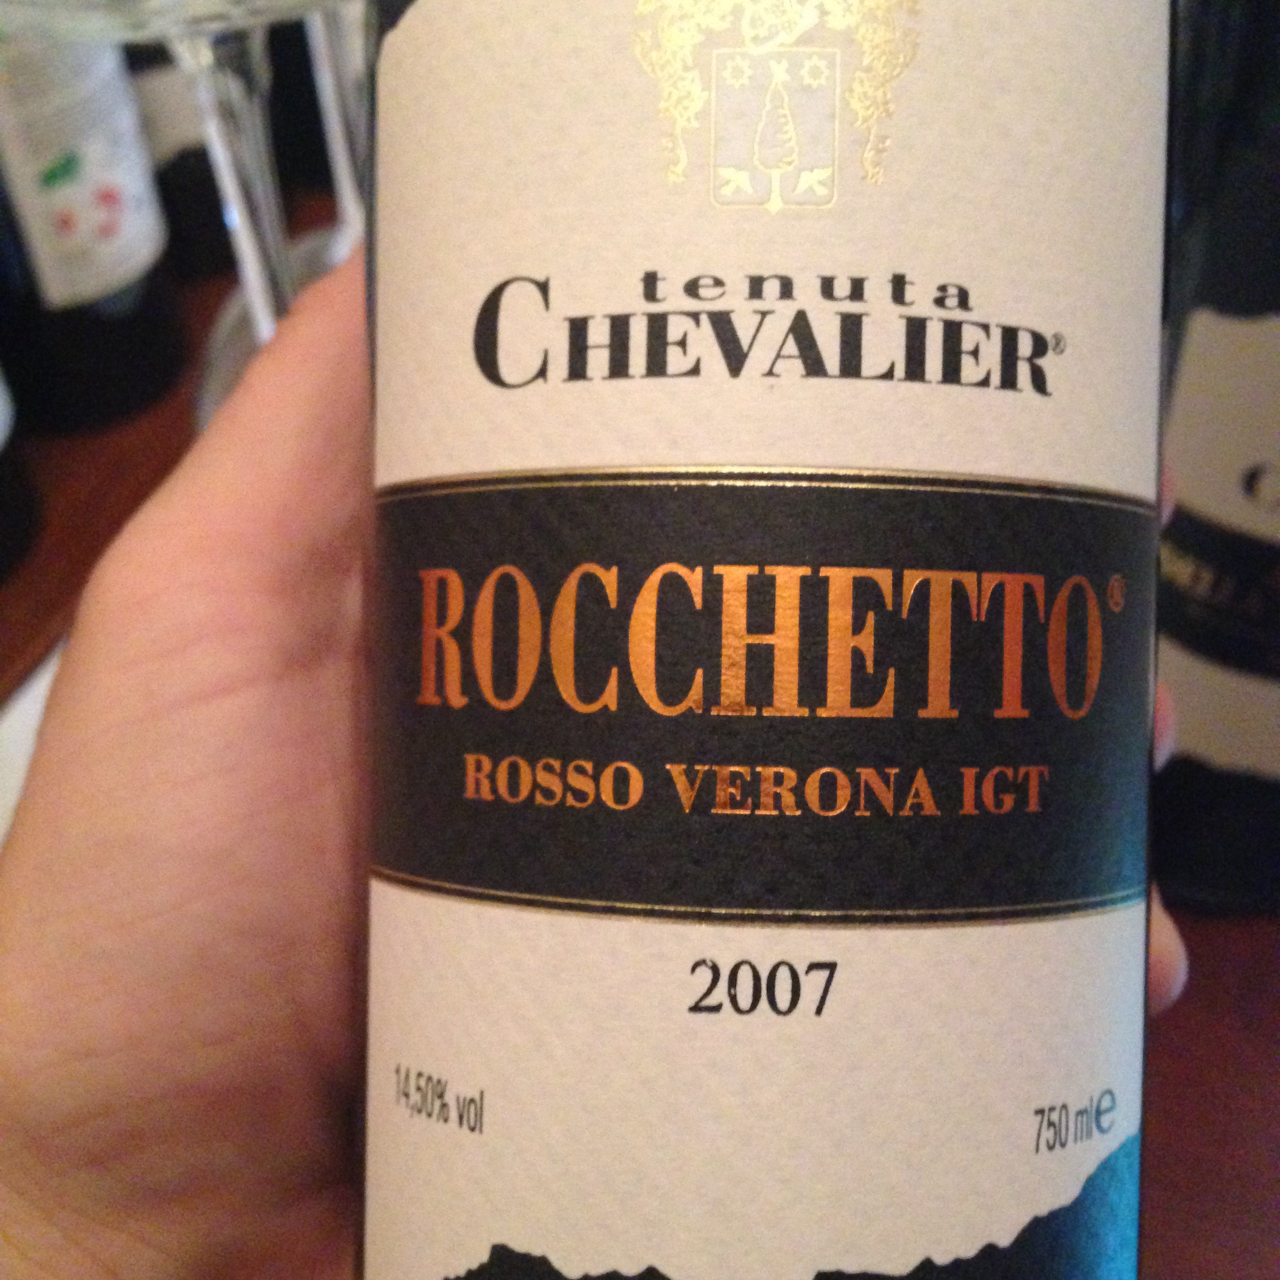 Chevalier Rocchetto 2007.PNG